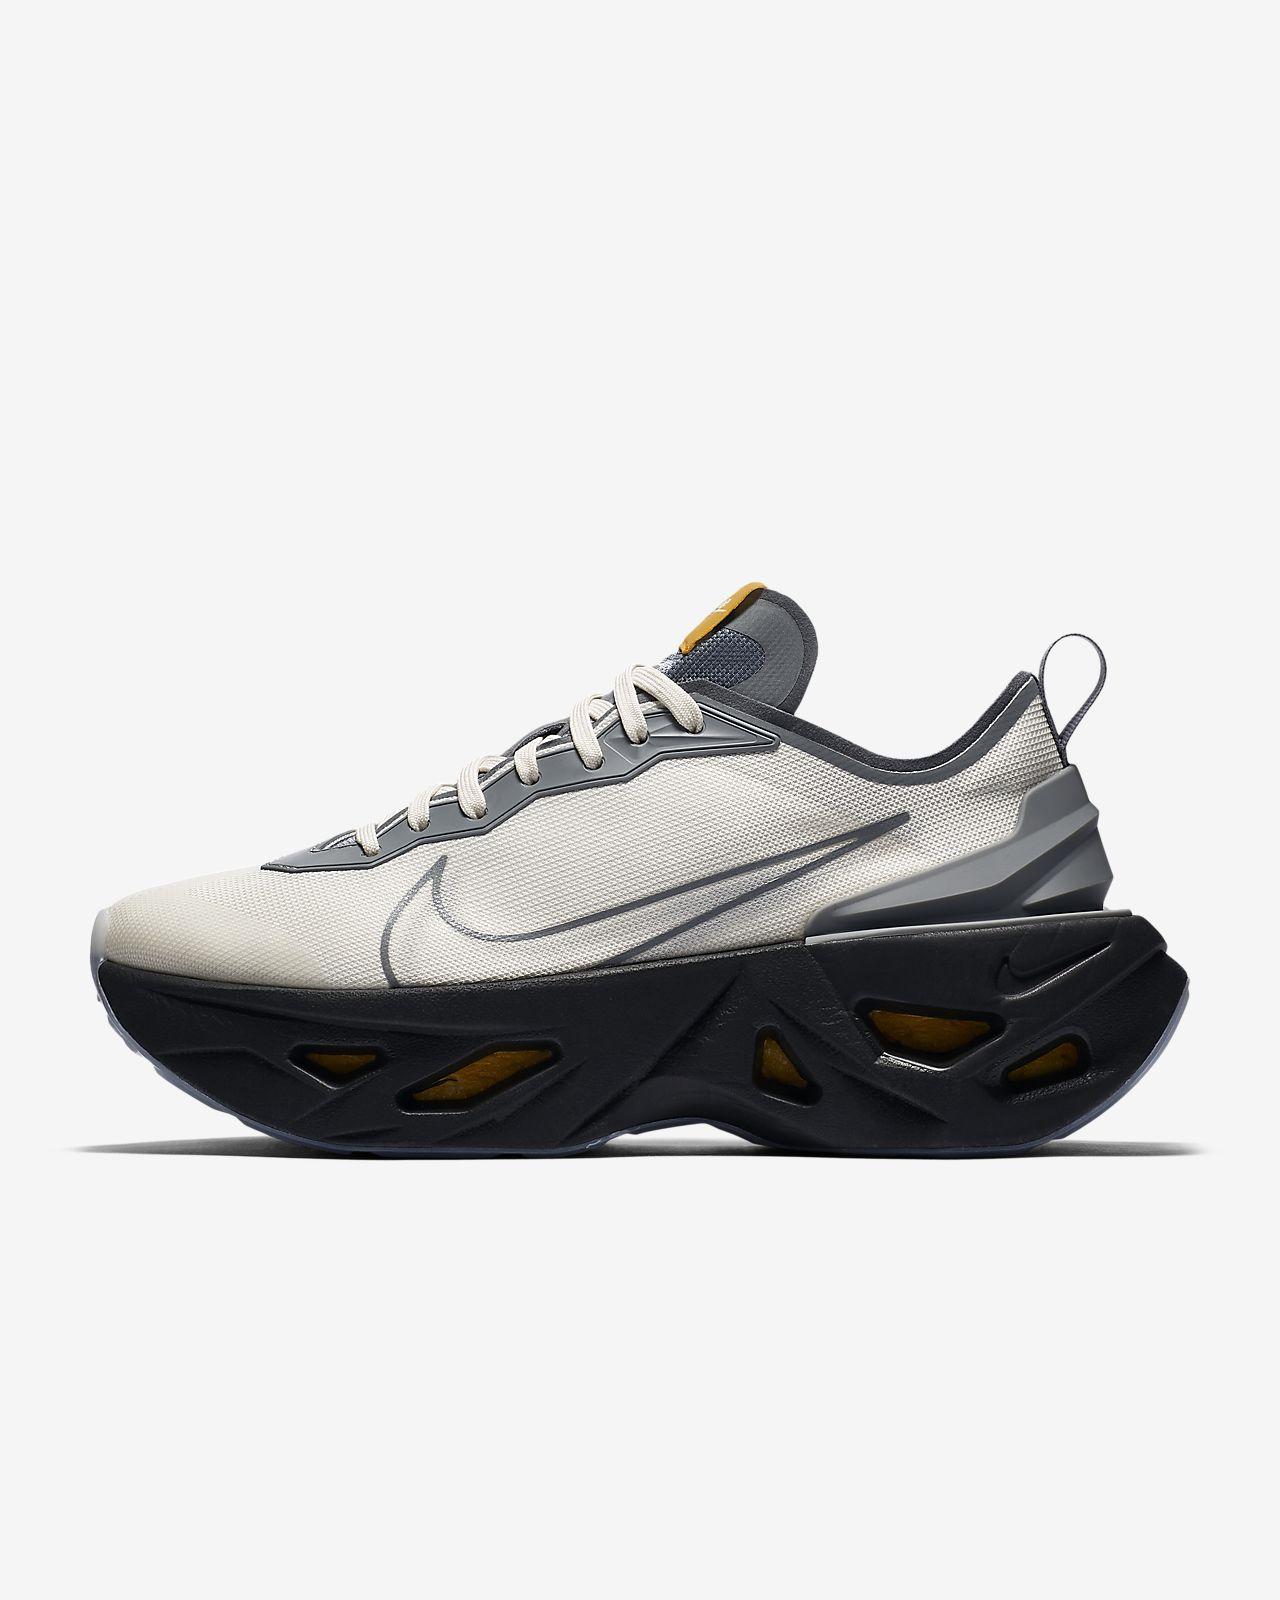 Nike Zoom X Vista Grind Women's Shoe